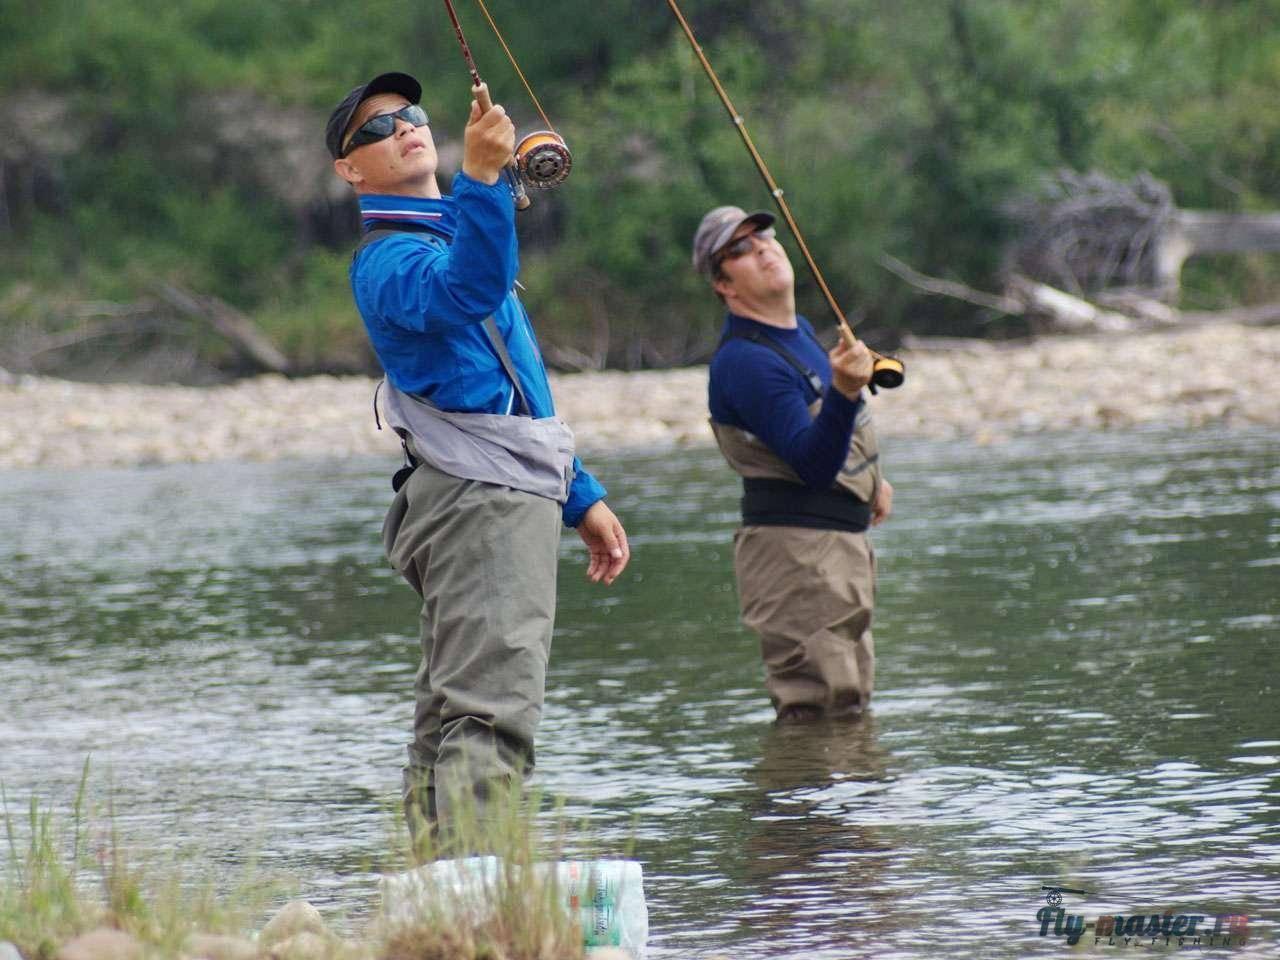 На реку с нахлыстом. разбираемся в тонкостях рыбалки